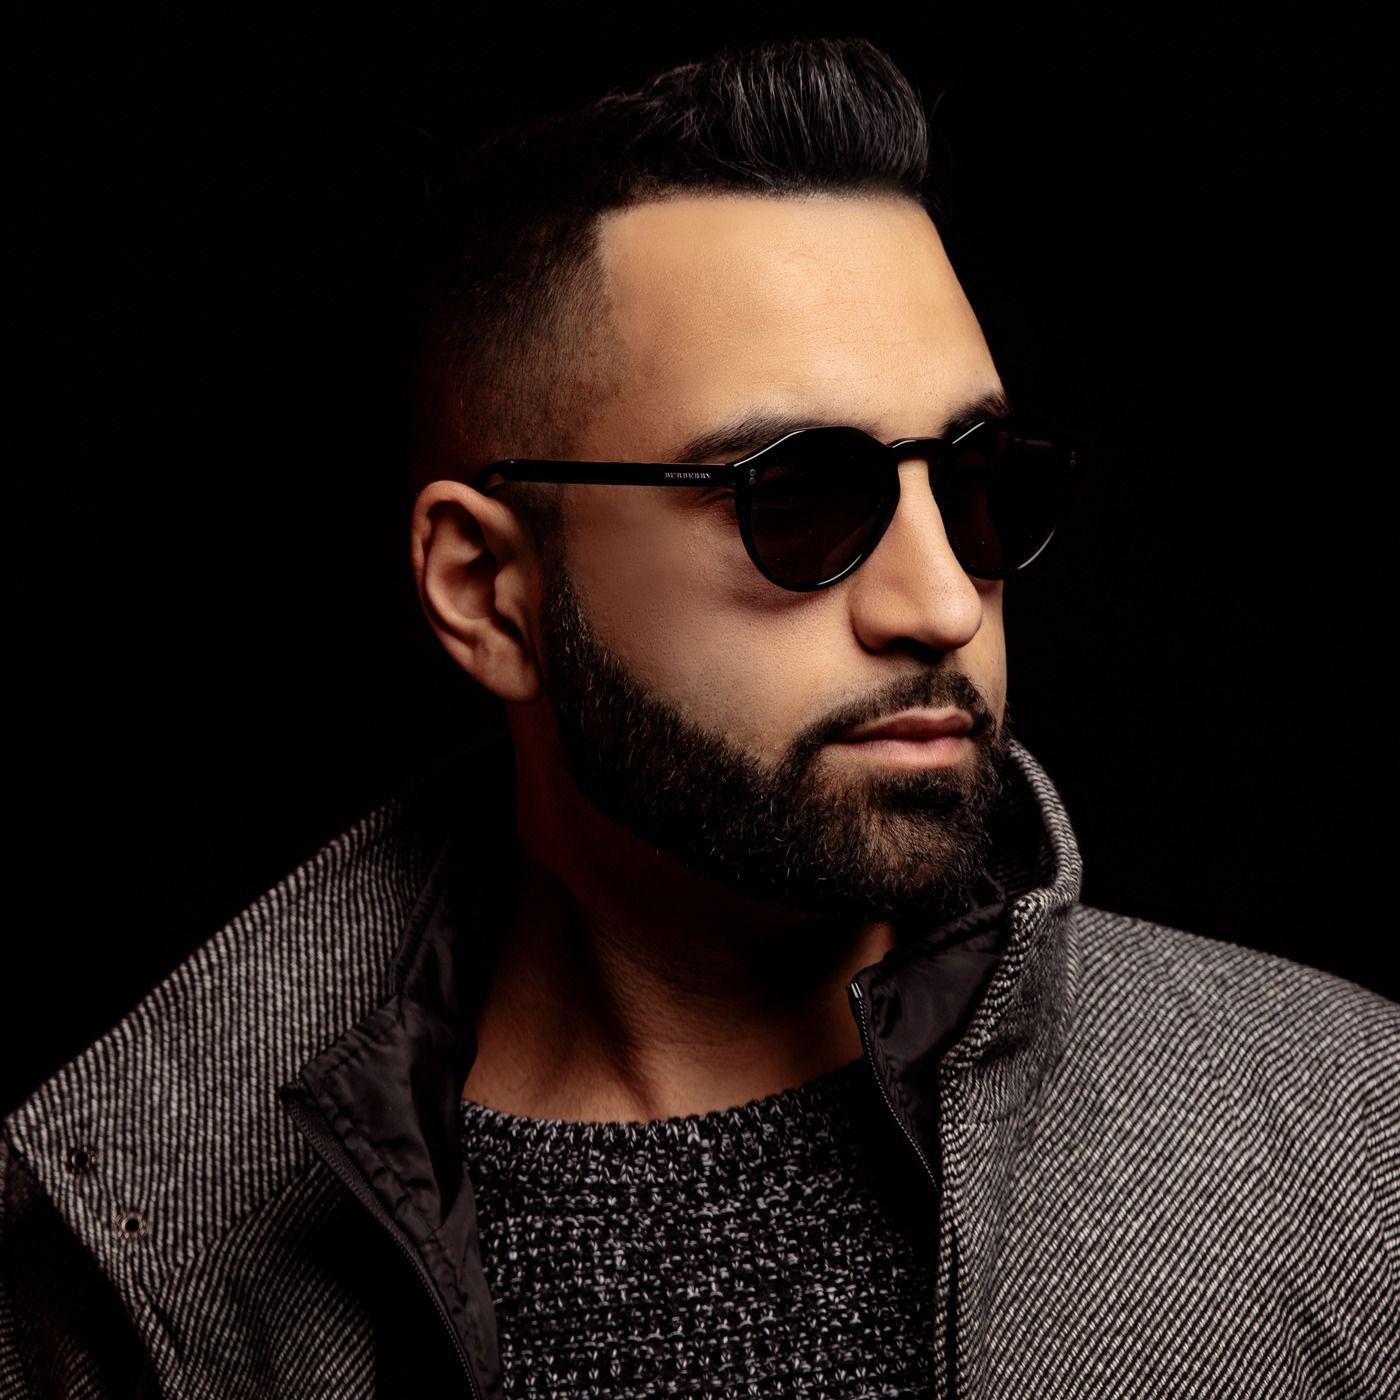 New 2018 Persian Dance Music Mix - DJ BORHAN SUPERMIX 4